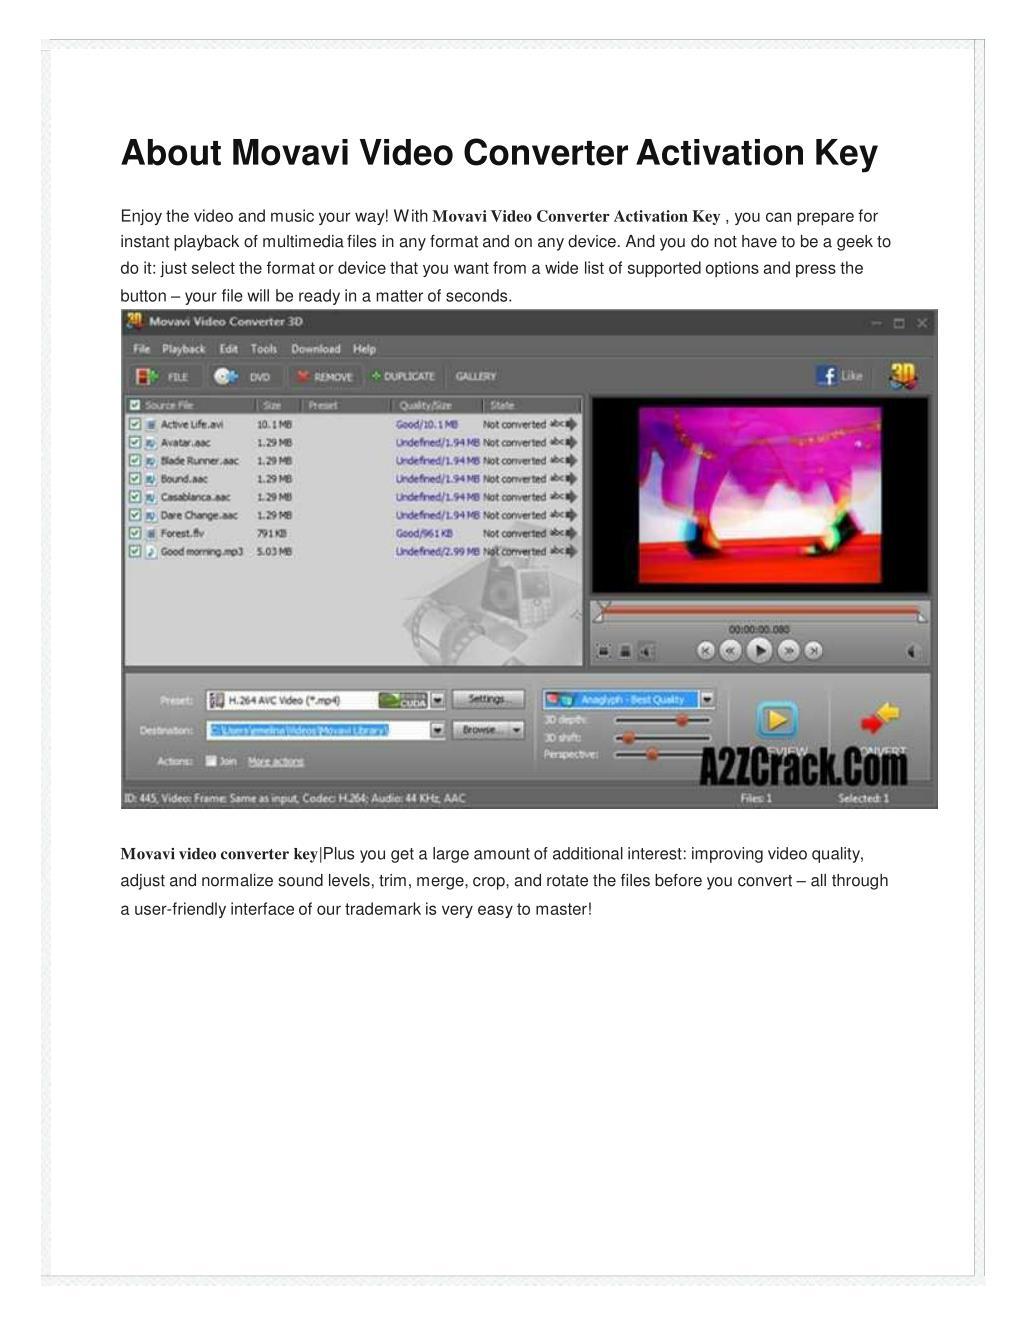 movavi video converter 10 activation key